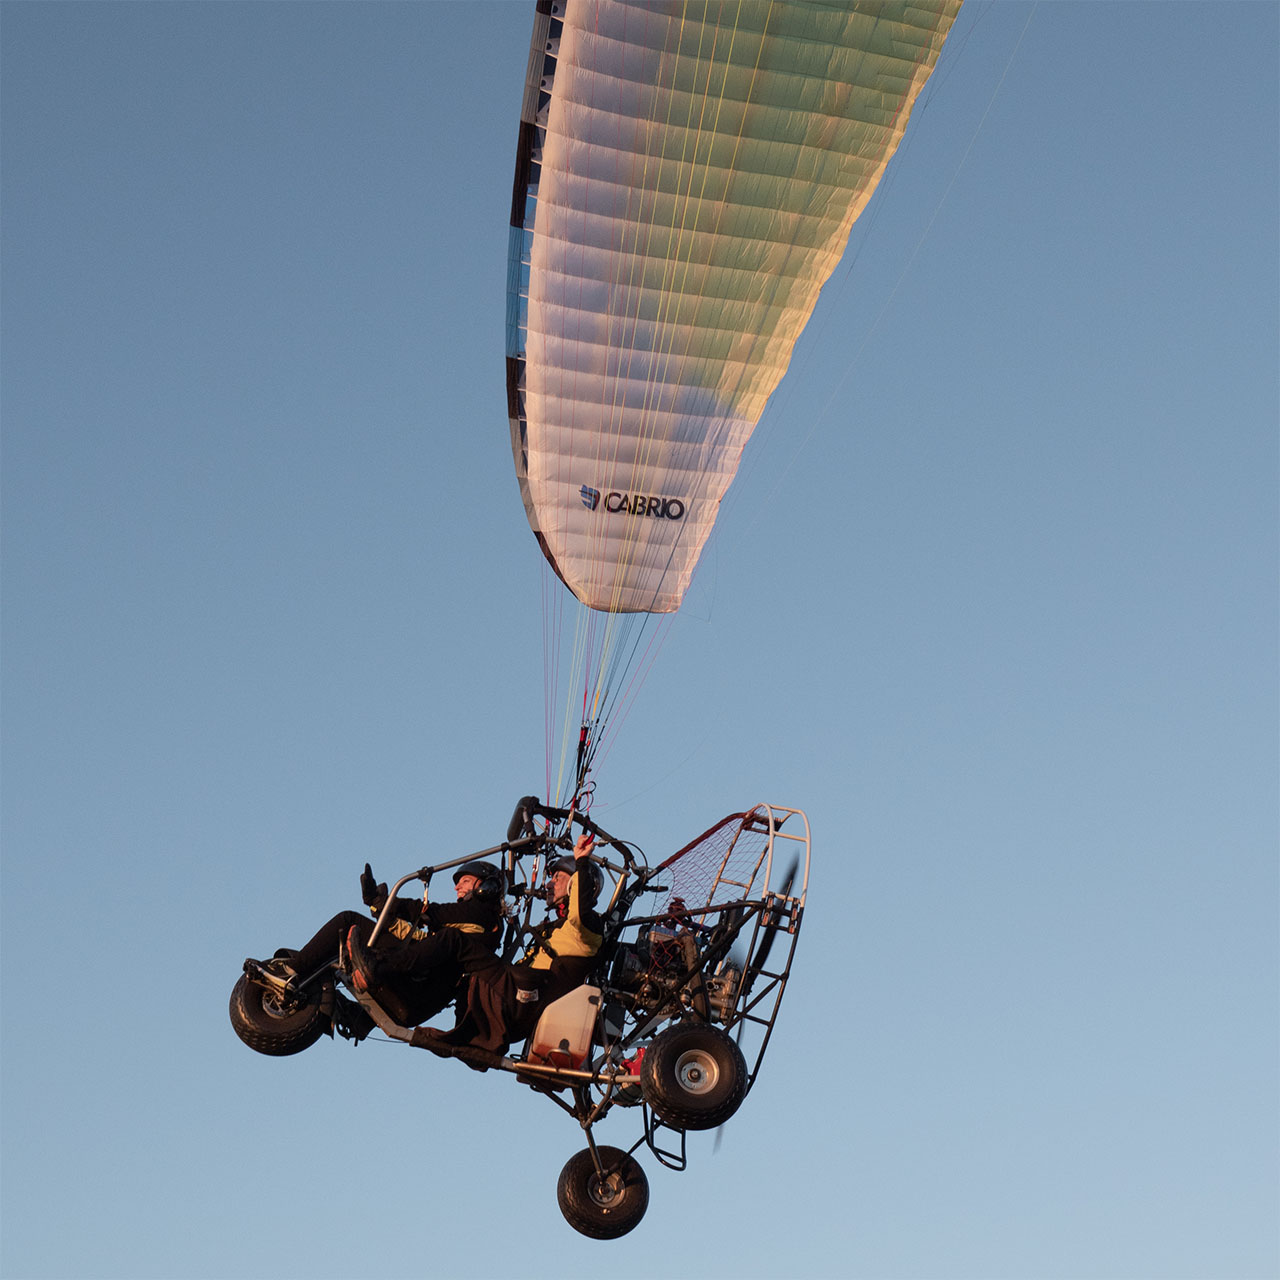 aeroclub-paracarrello-albatros-acqui-terme-paracarrello-slide6